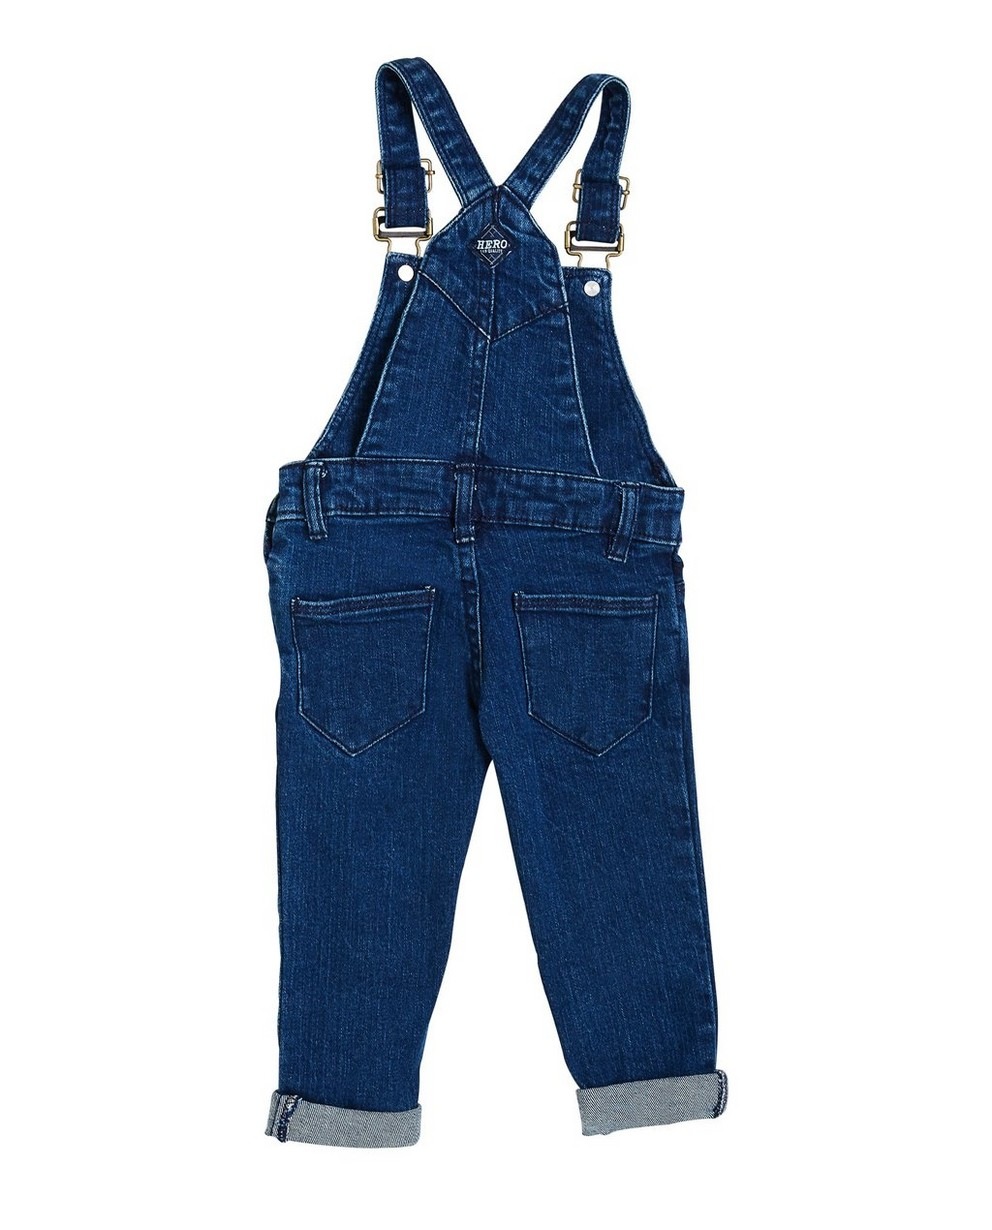 Jeans - BLD - Jeanssalopette